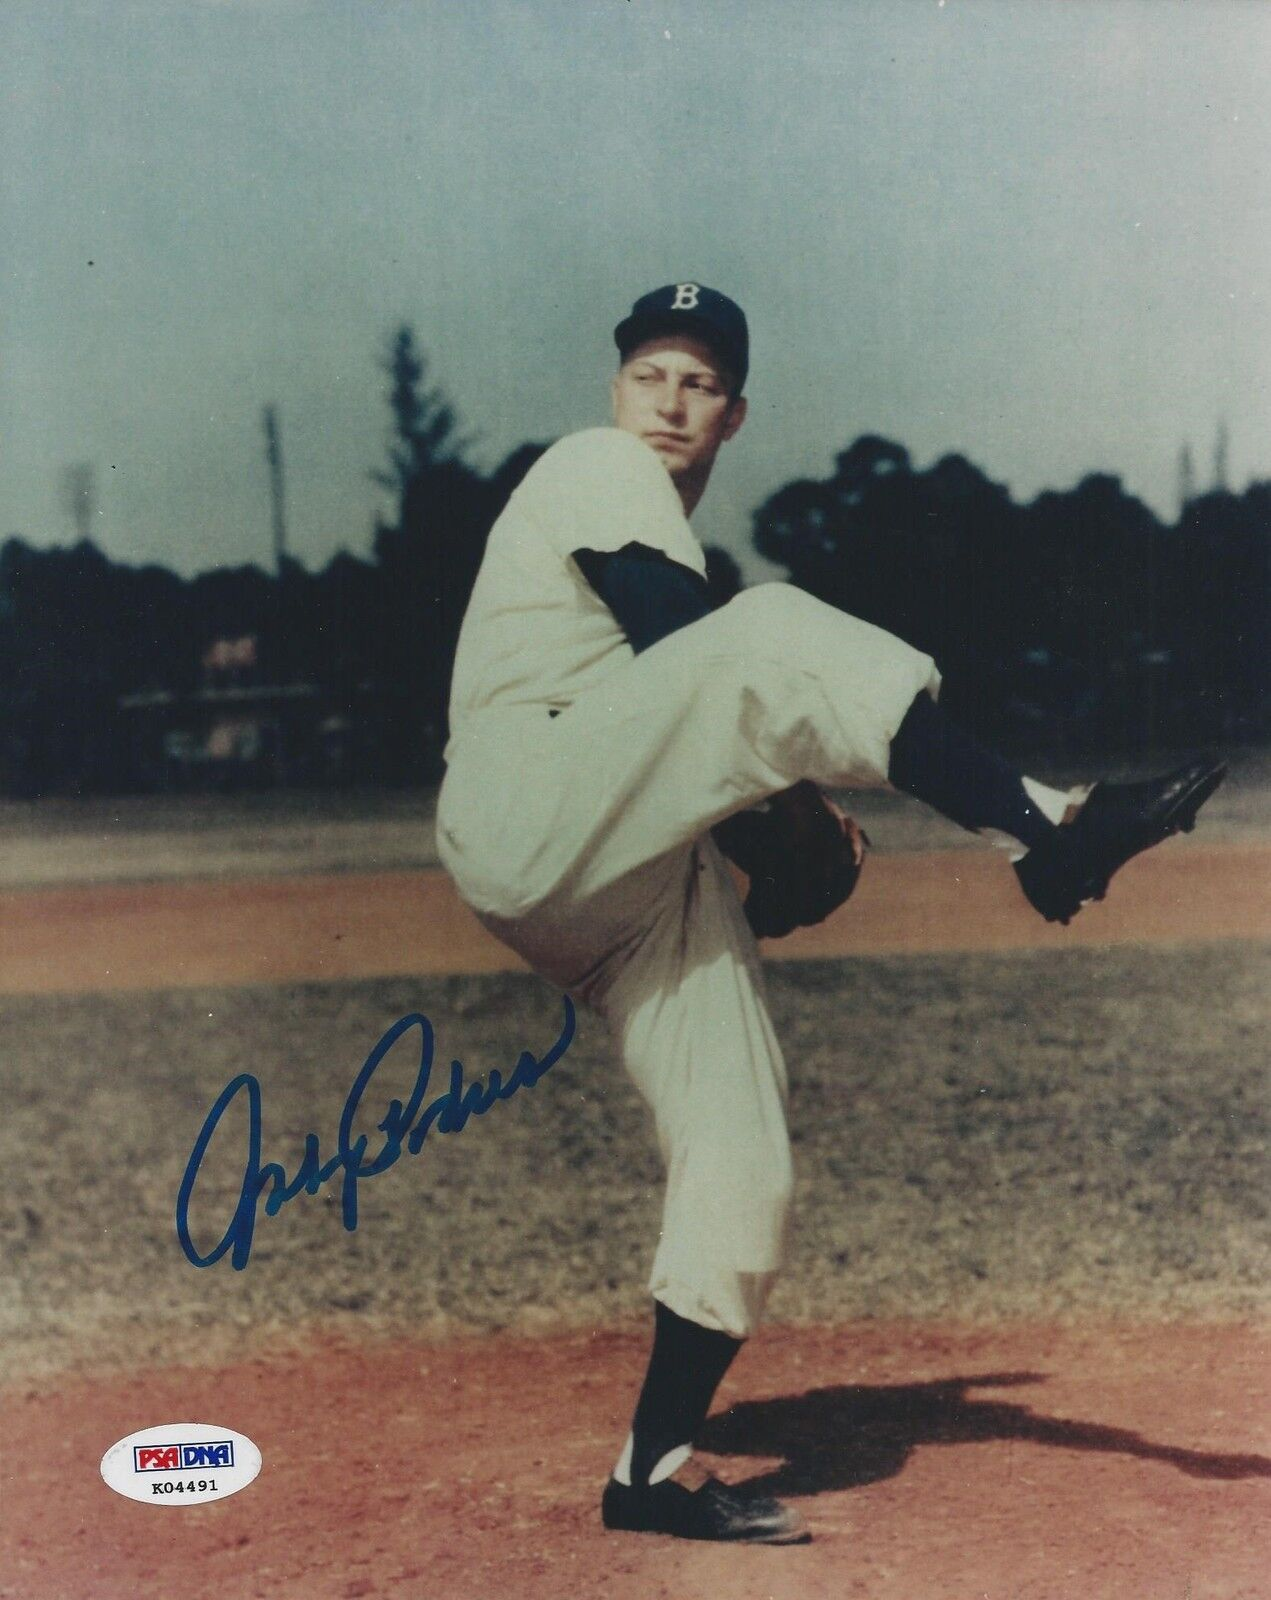 Johnny Podres Brooklyn Dodgers signed 8x10 photo PSA/DNA #K04491